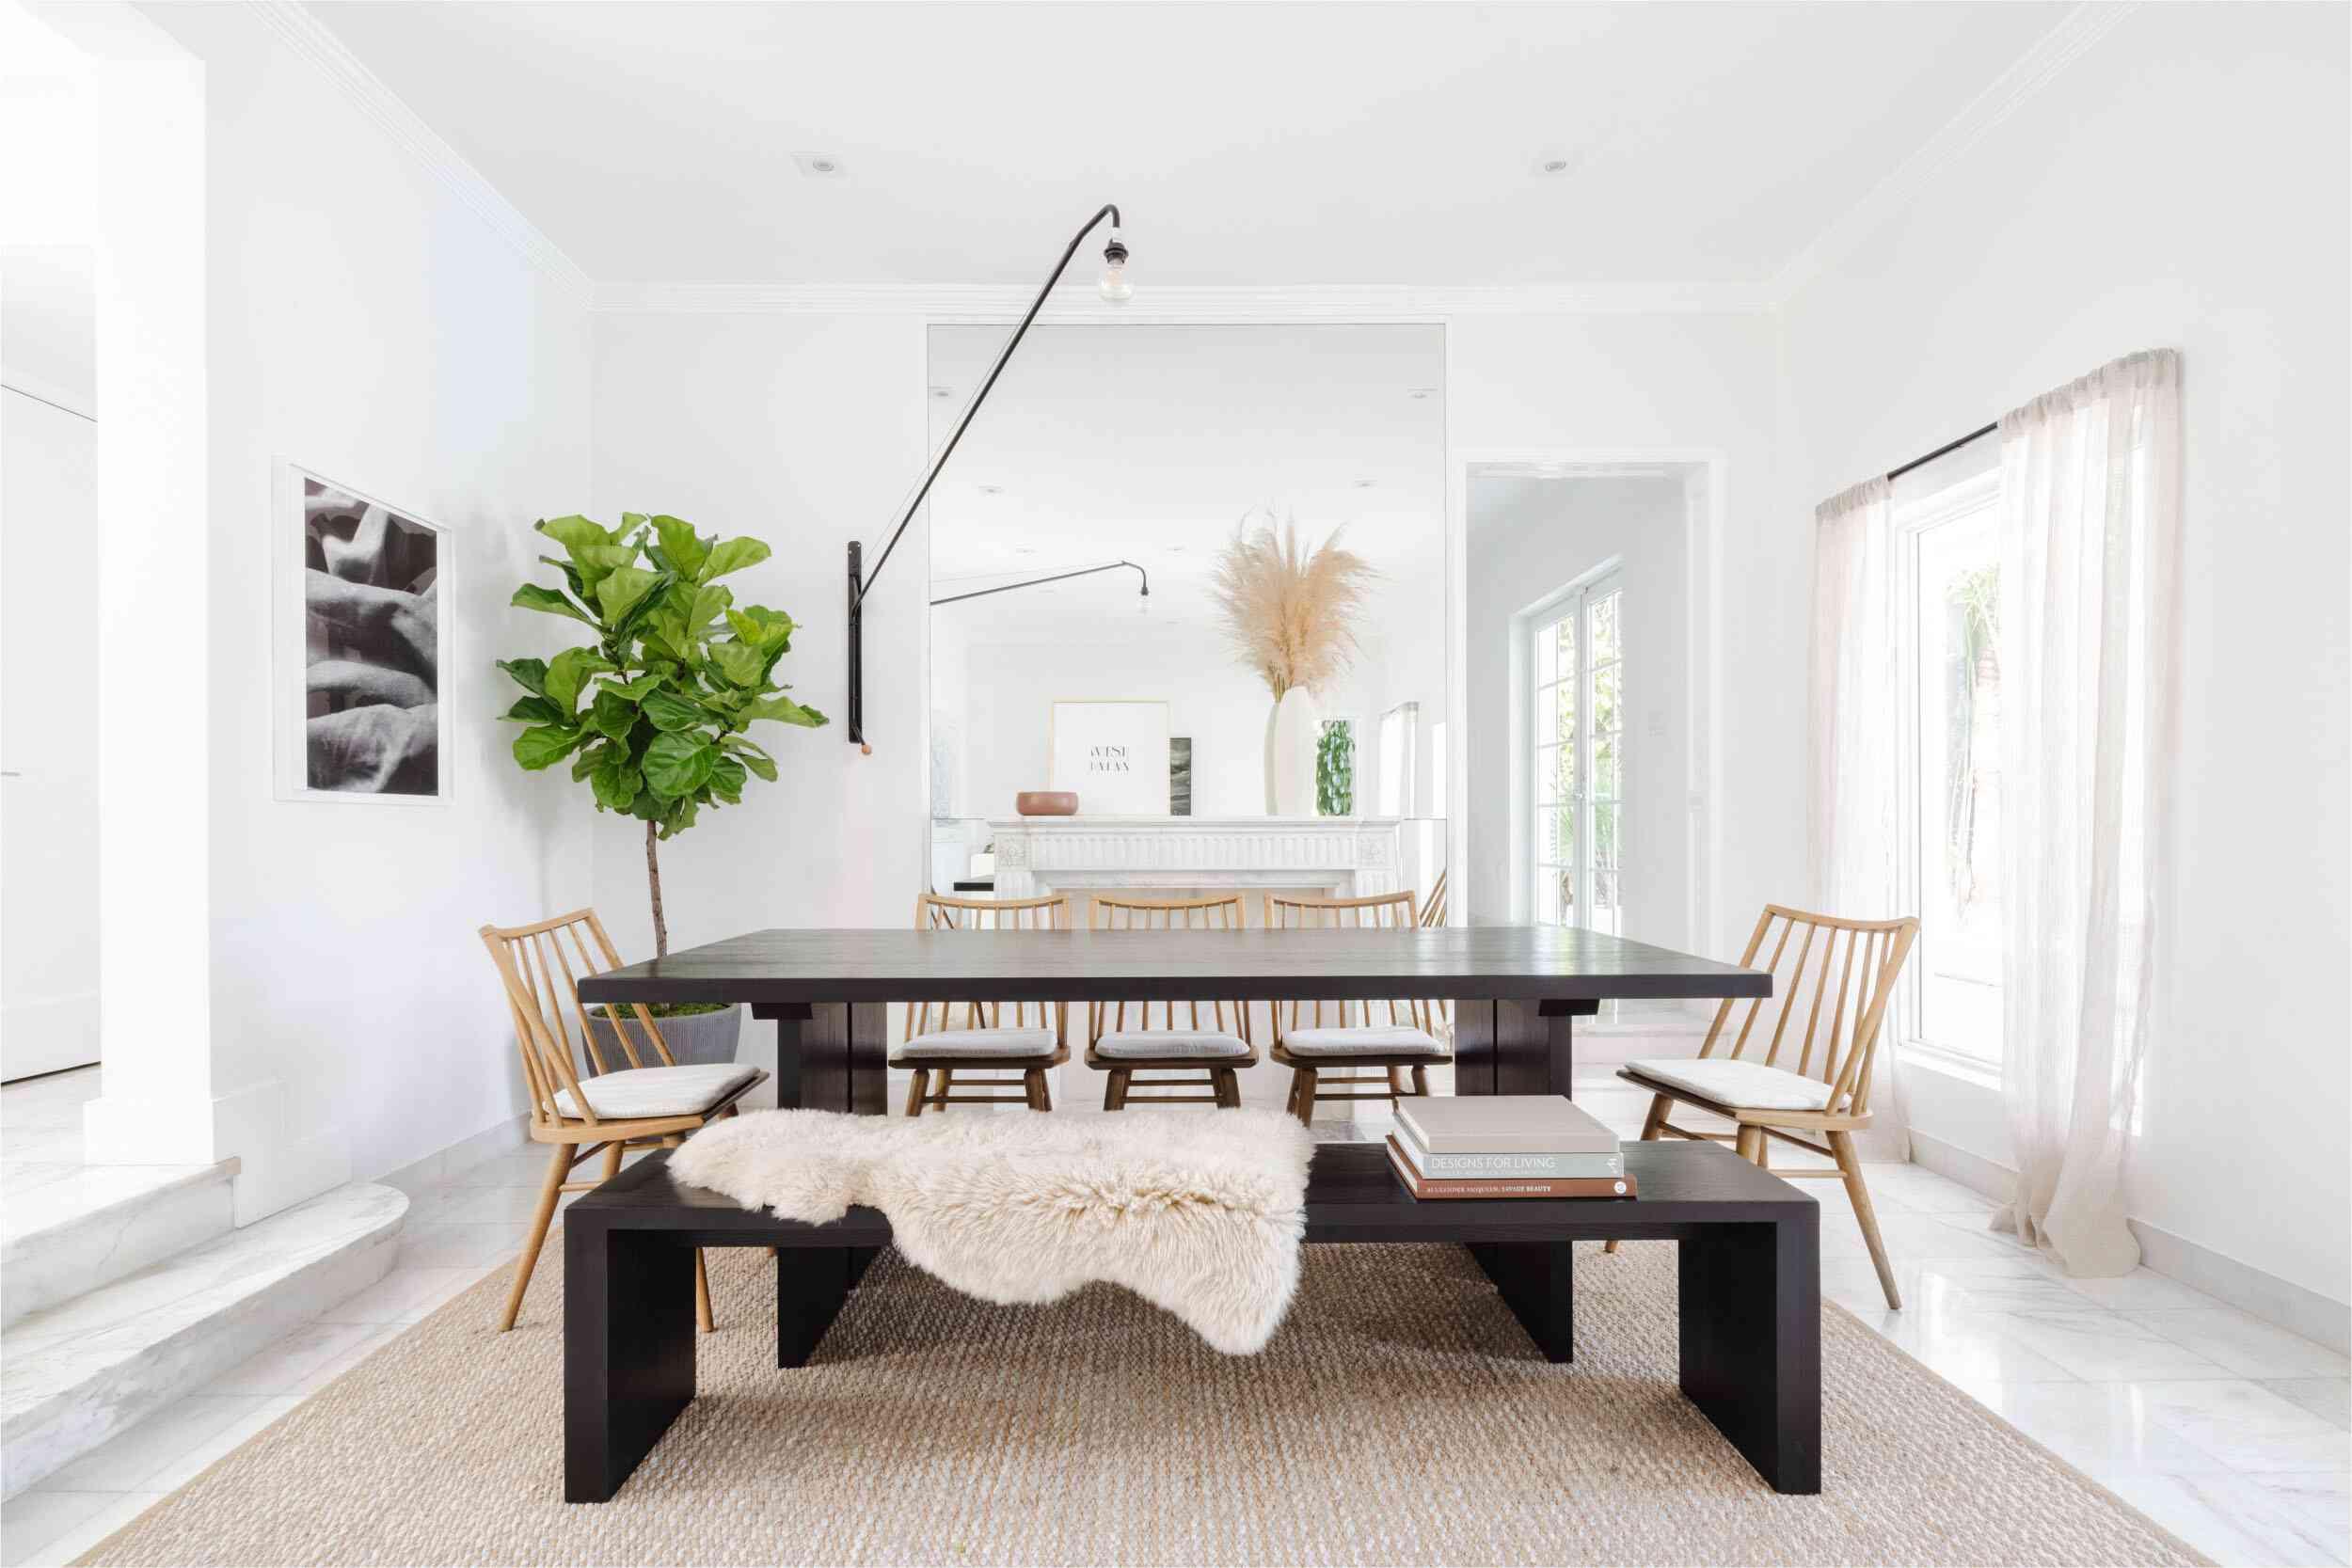 Sheepskin rug draped over a dining room bench